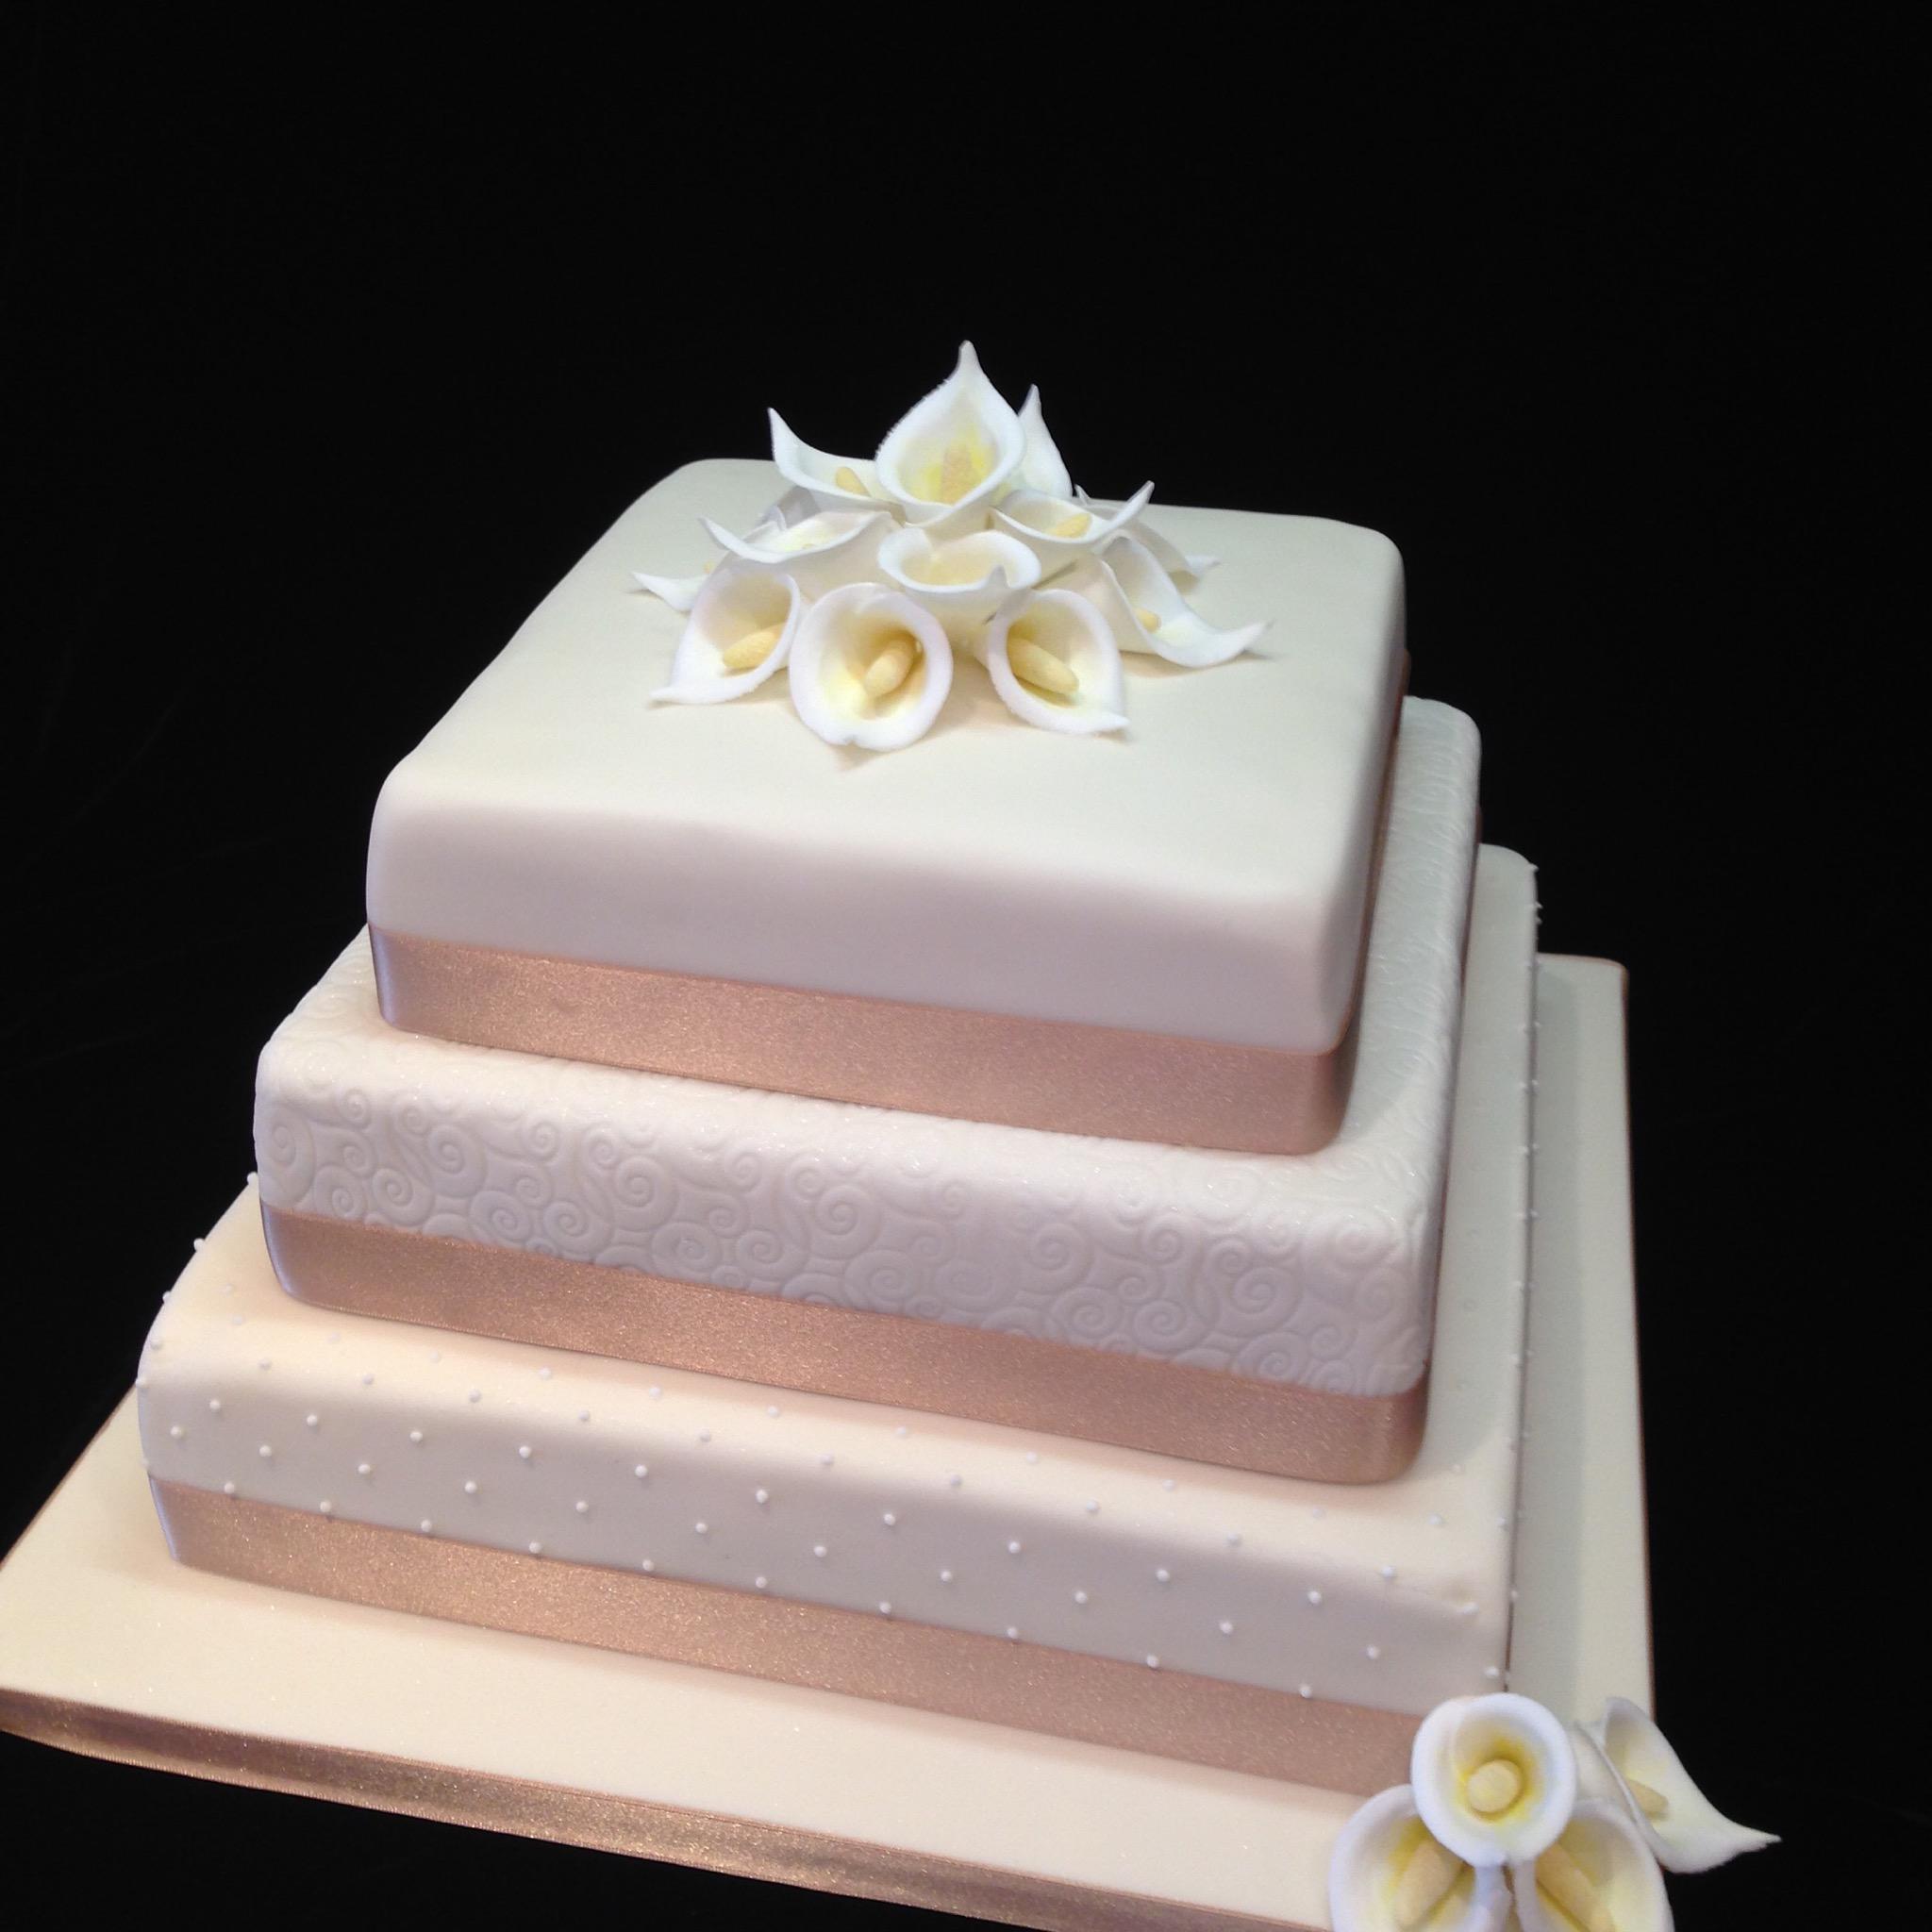 Nathalie & Jamie Lucas' Calla Lily Wedding Cake